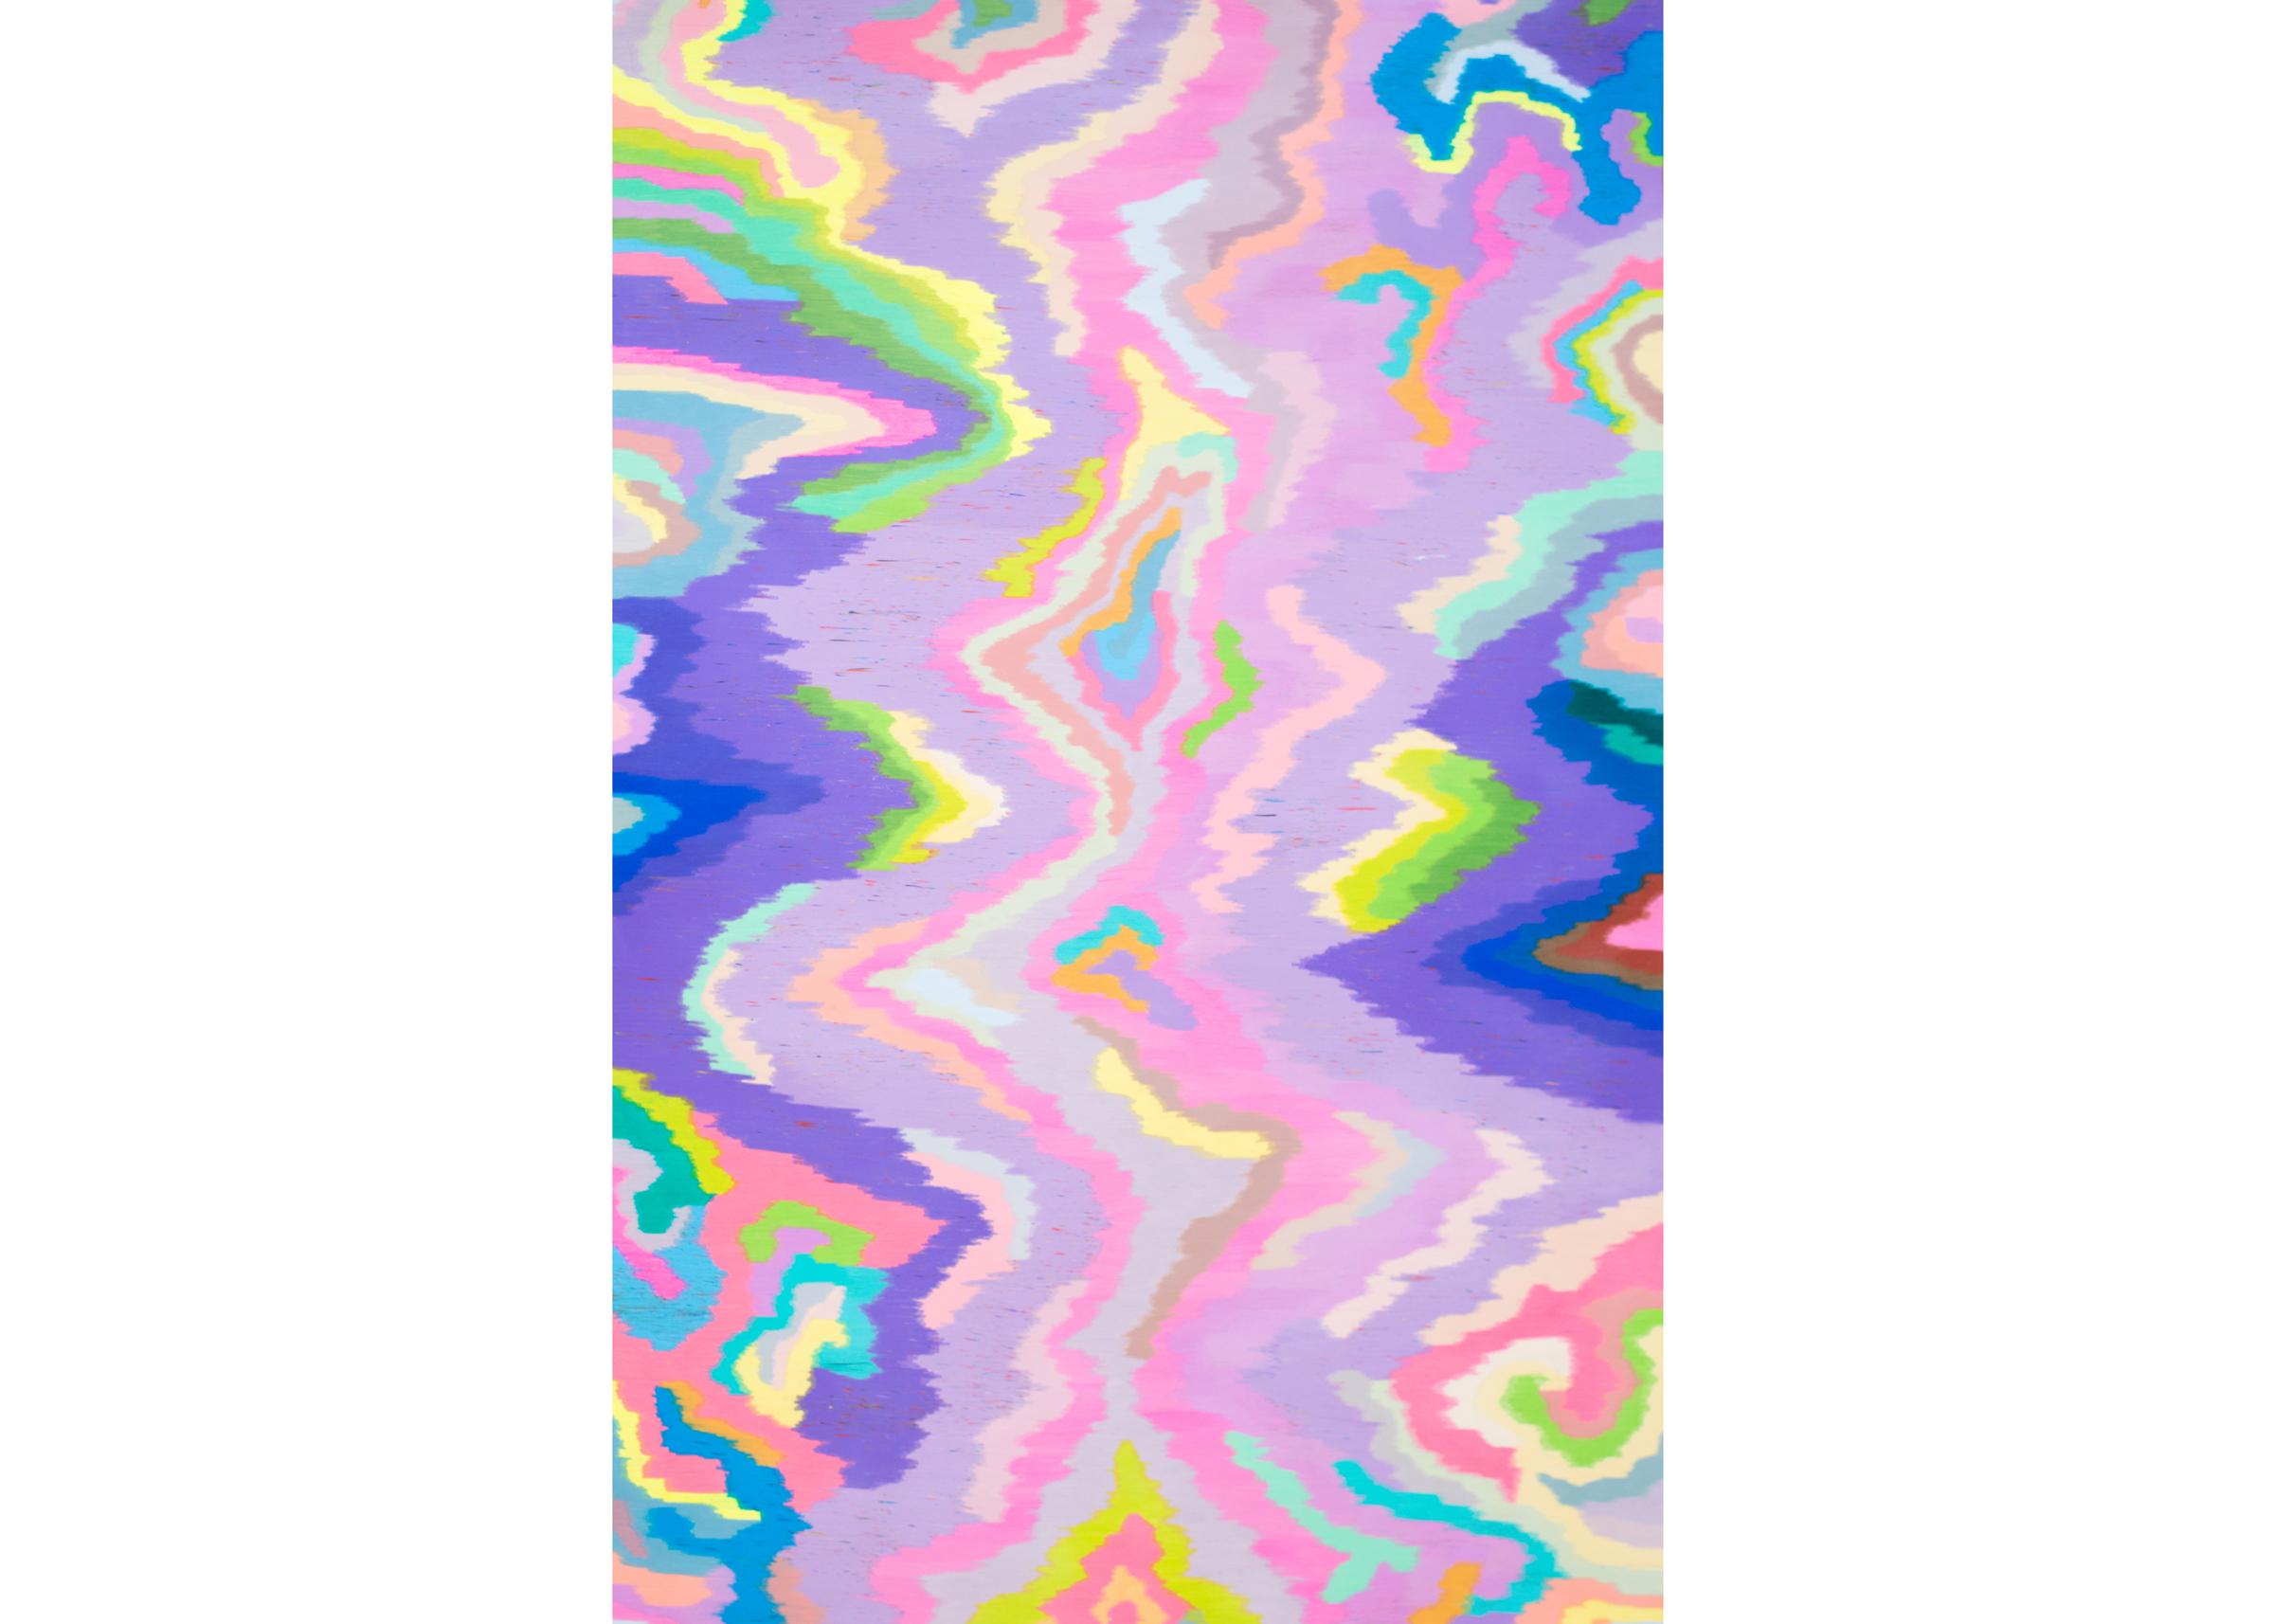 Scrambled Channel (Rainbow Bridge), 2014, color pencil on paper, 80 x 51 in.